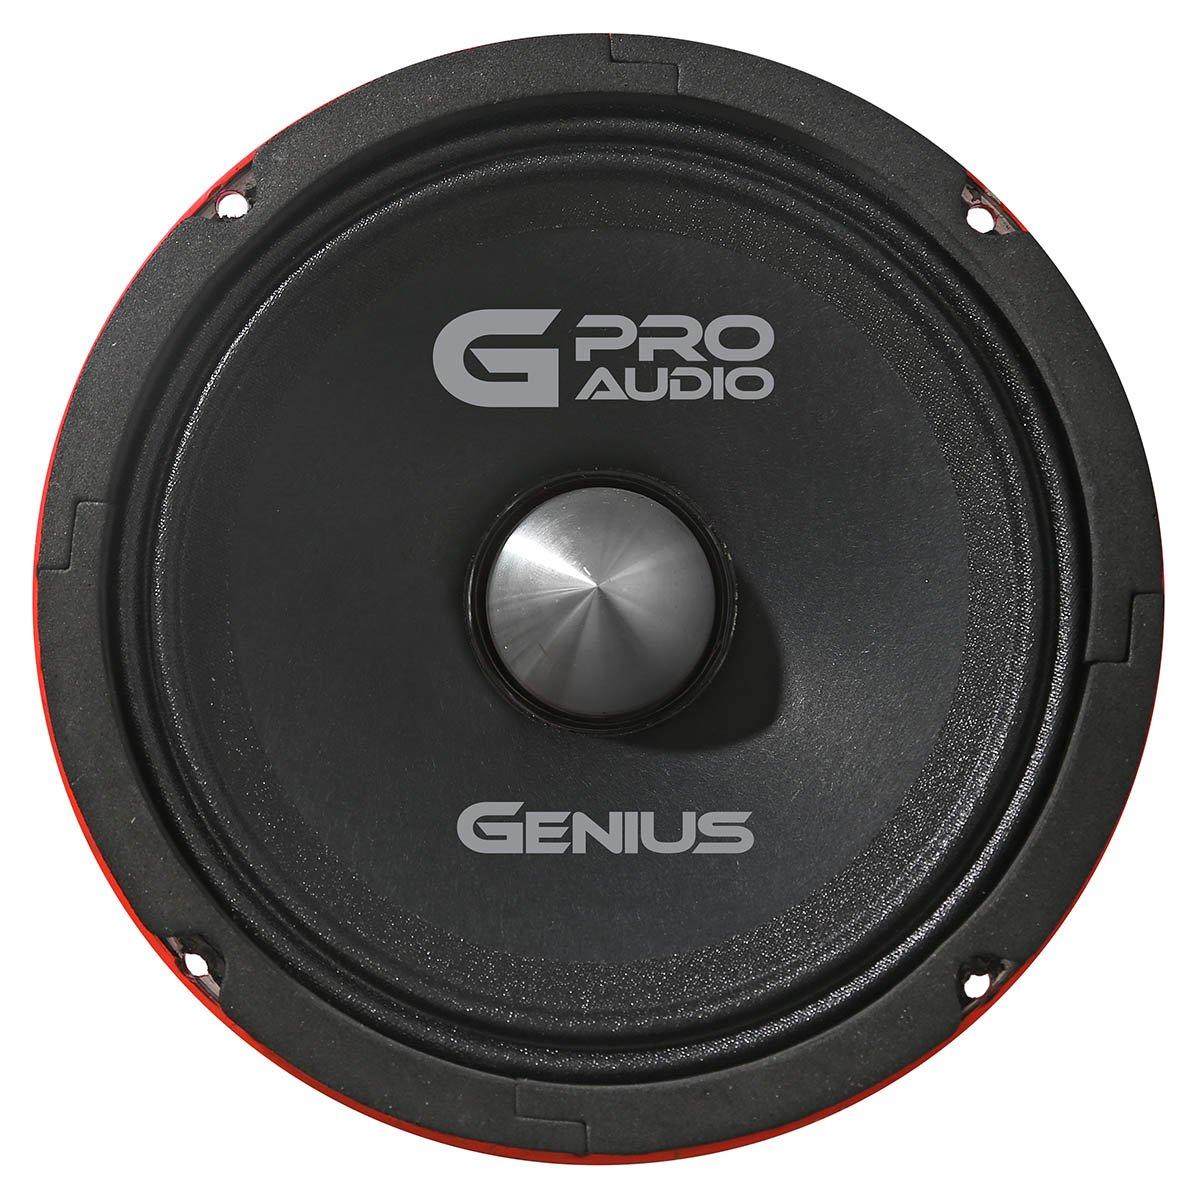 Genius GPRO-M06525 5.25'' 280 Watts-Max Midrange Neodymiun Car Audio Speaker 4-Ohms